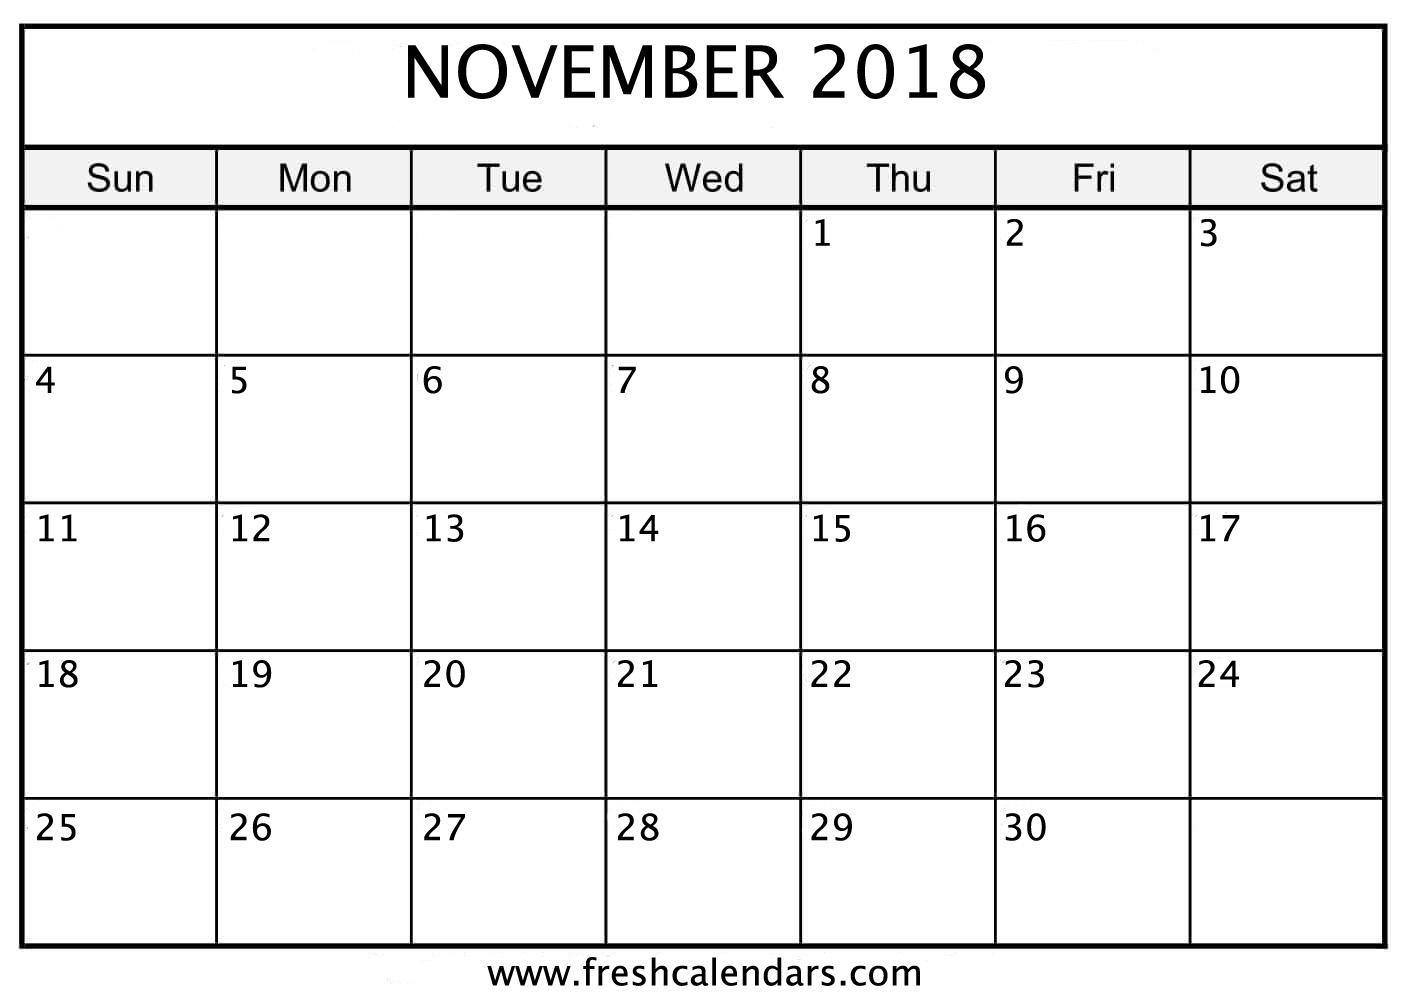 November 2018 Calendar Printable - Fresh Calendars regarding Microsoft November Calendar Templates